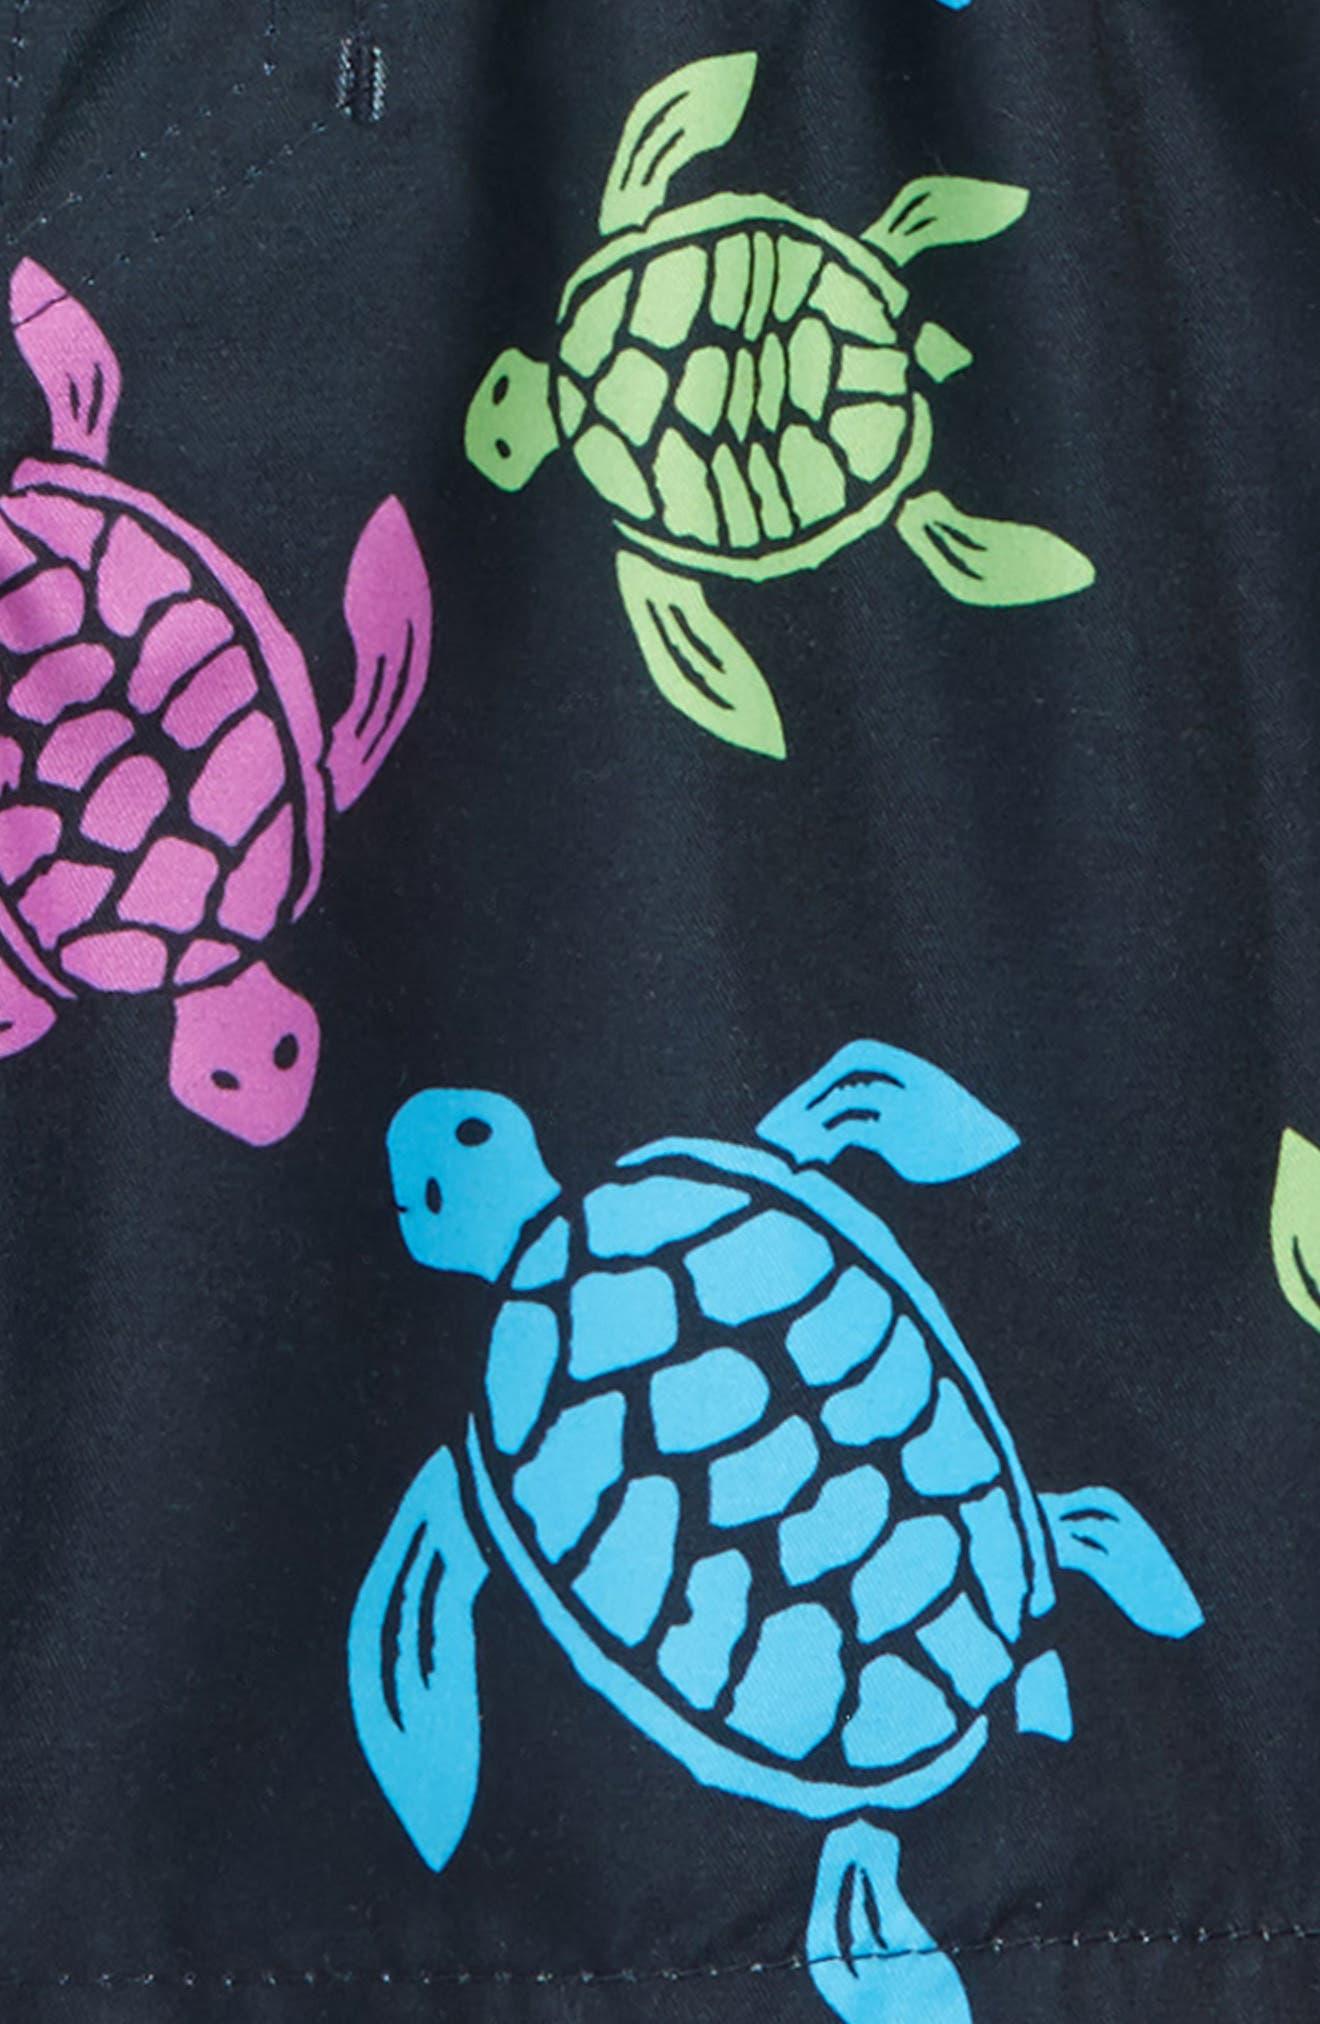 Turtle Two-Piece Rashguard Swimsuit,                             Alternate thumbnail 2, color,                             399